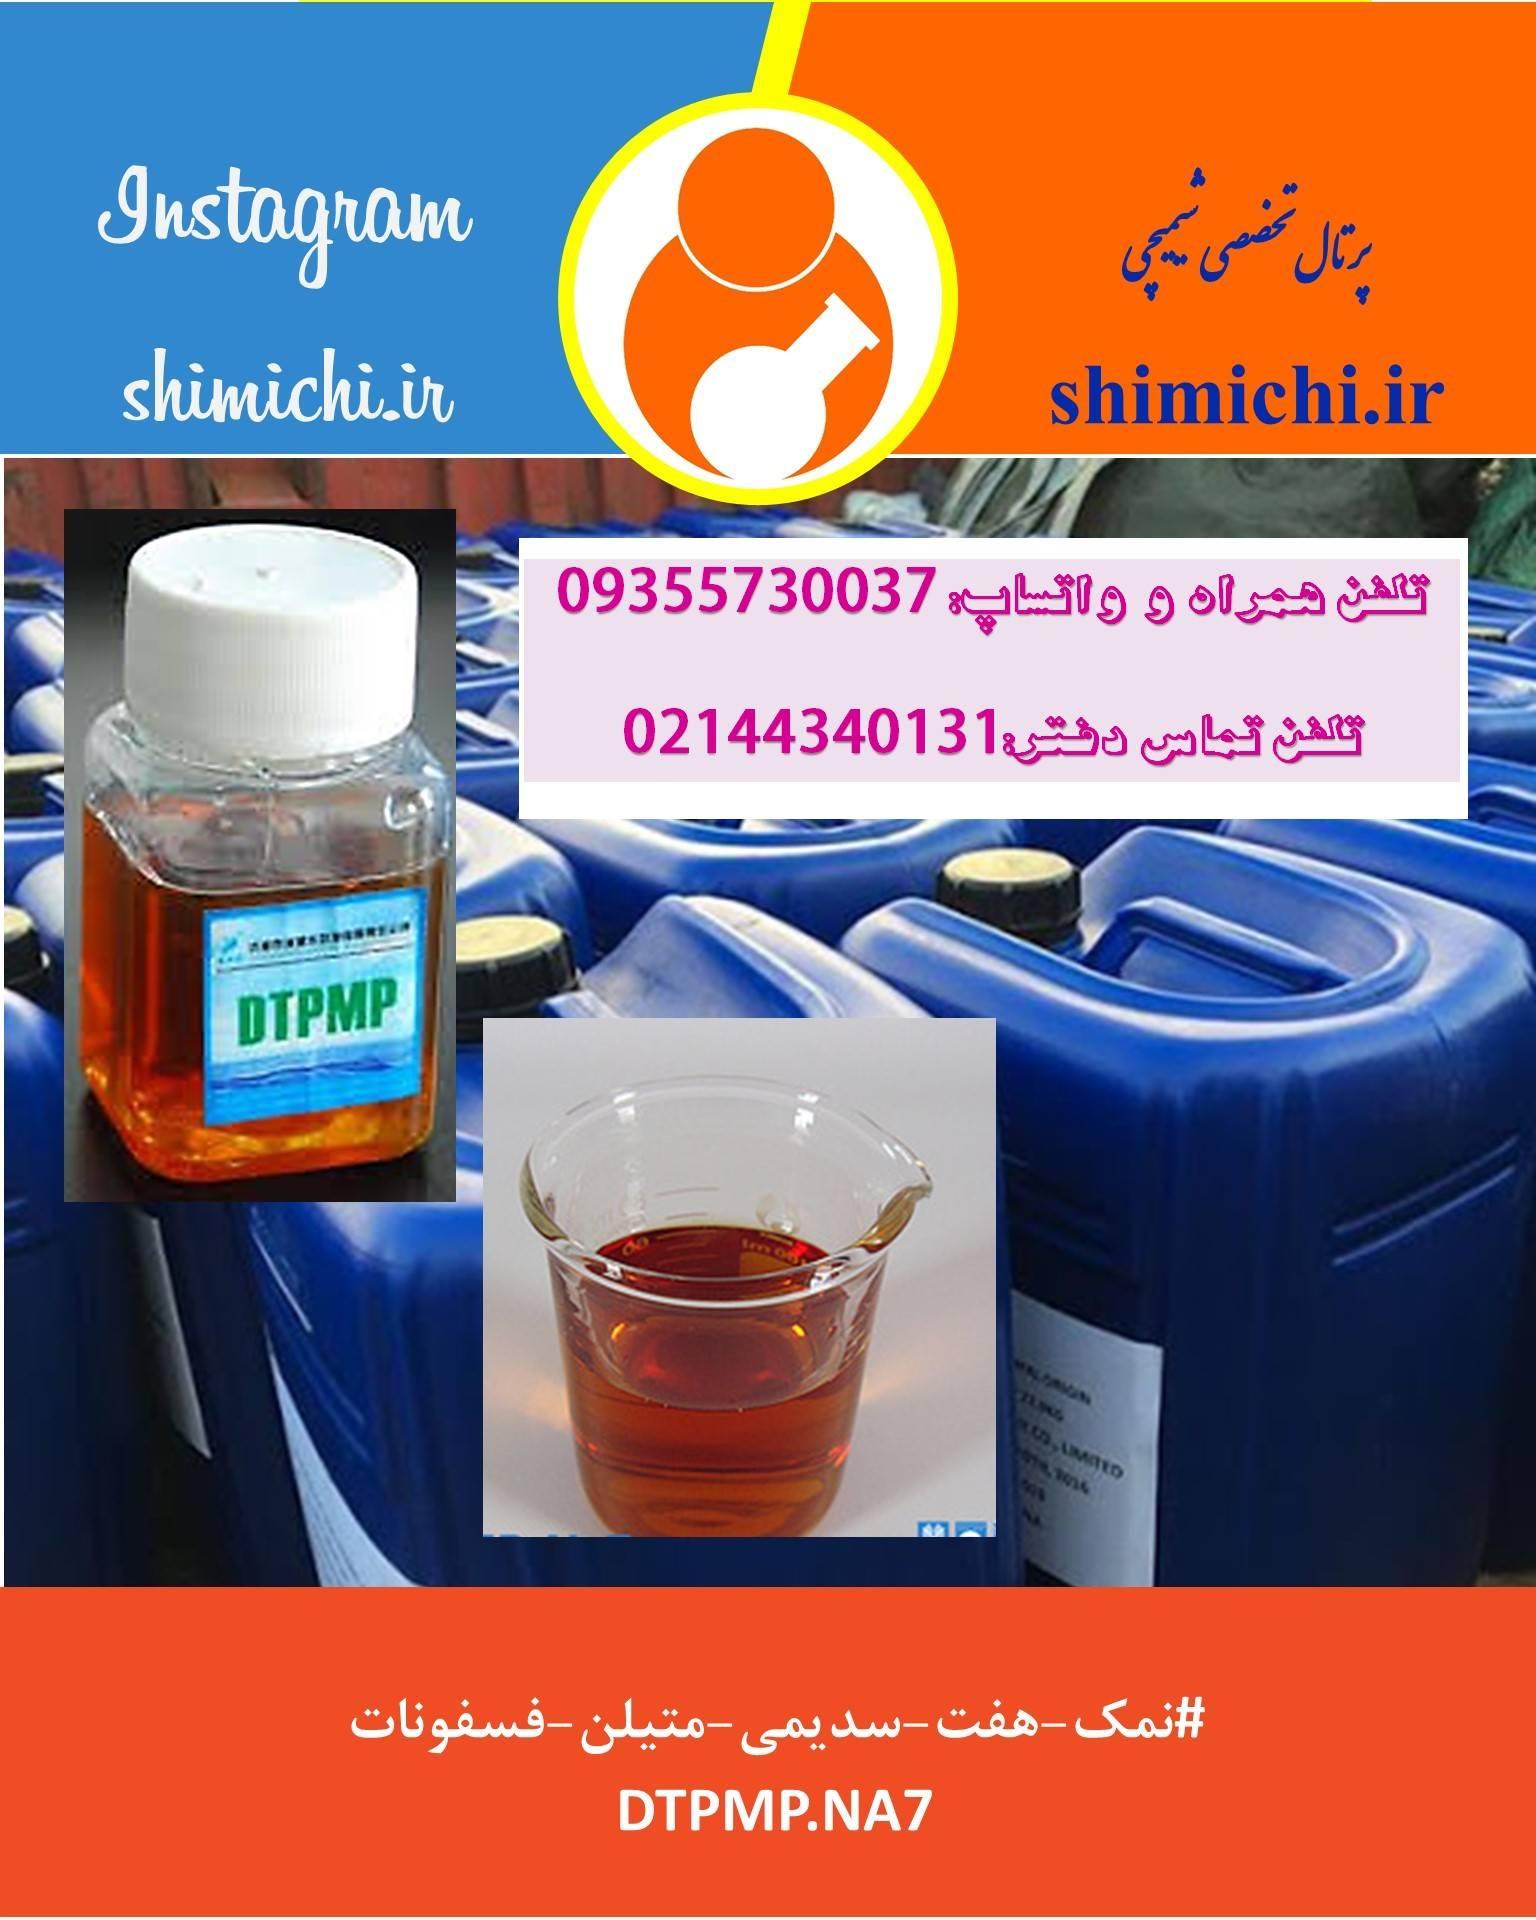 981112-descaler-1-1 فروش ویژه نمک هفت سدیمی DTPMP